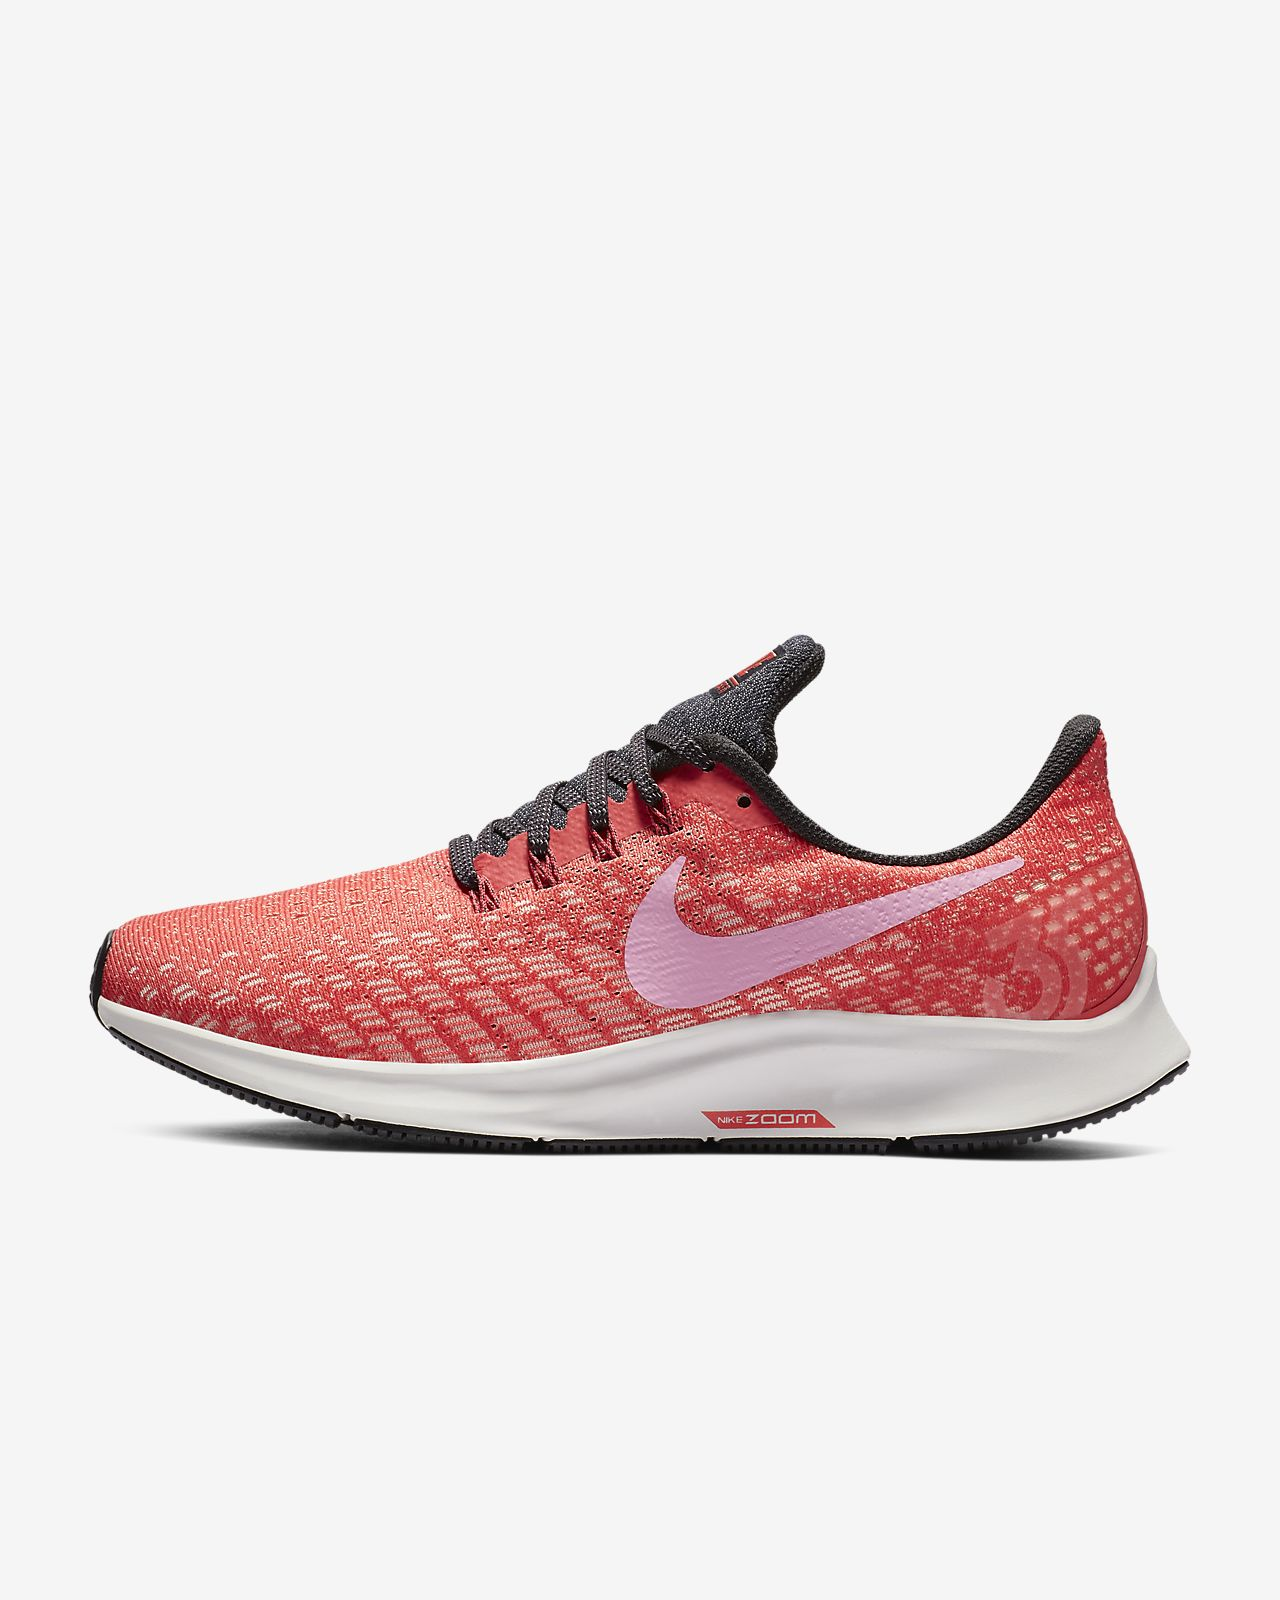 f7e48f3776c Nike Air Zoom Pegasus 35 Zapatillas de running - Mujer. Nike.com ES